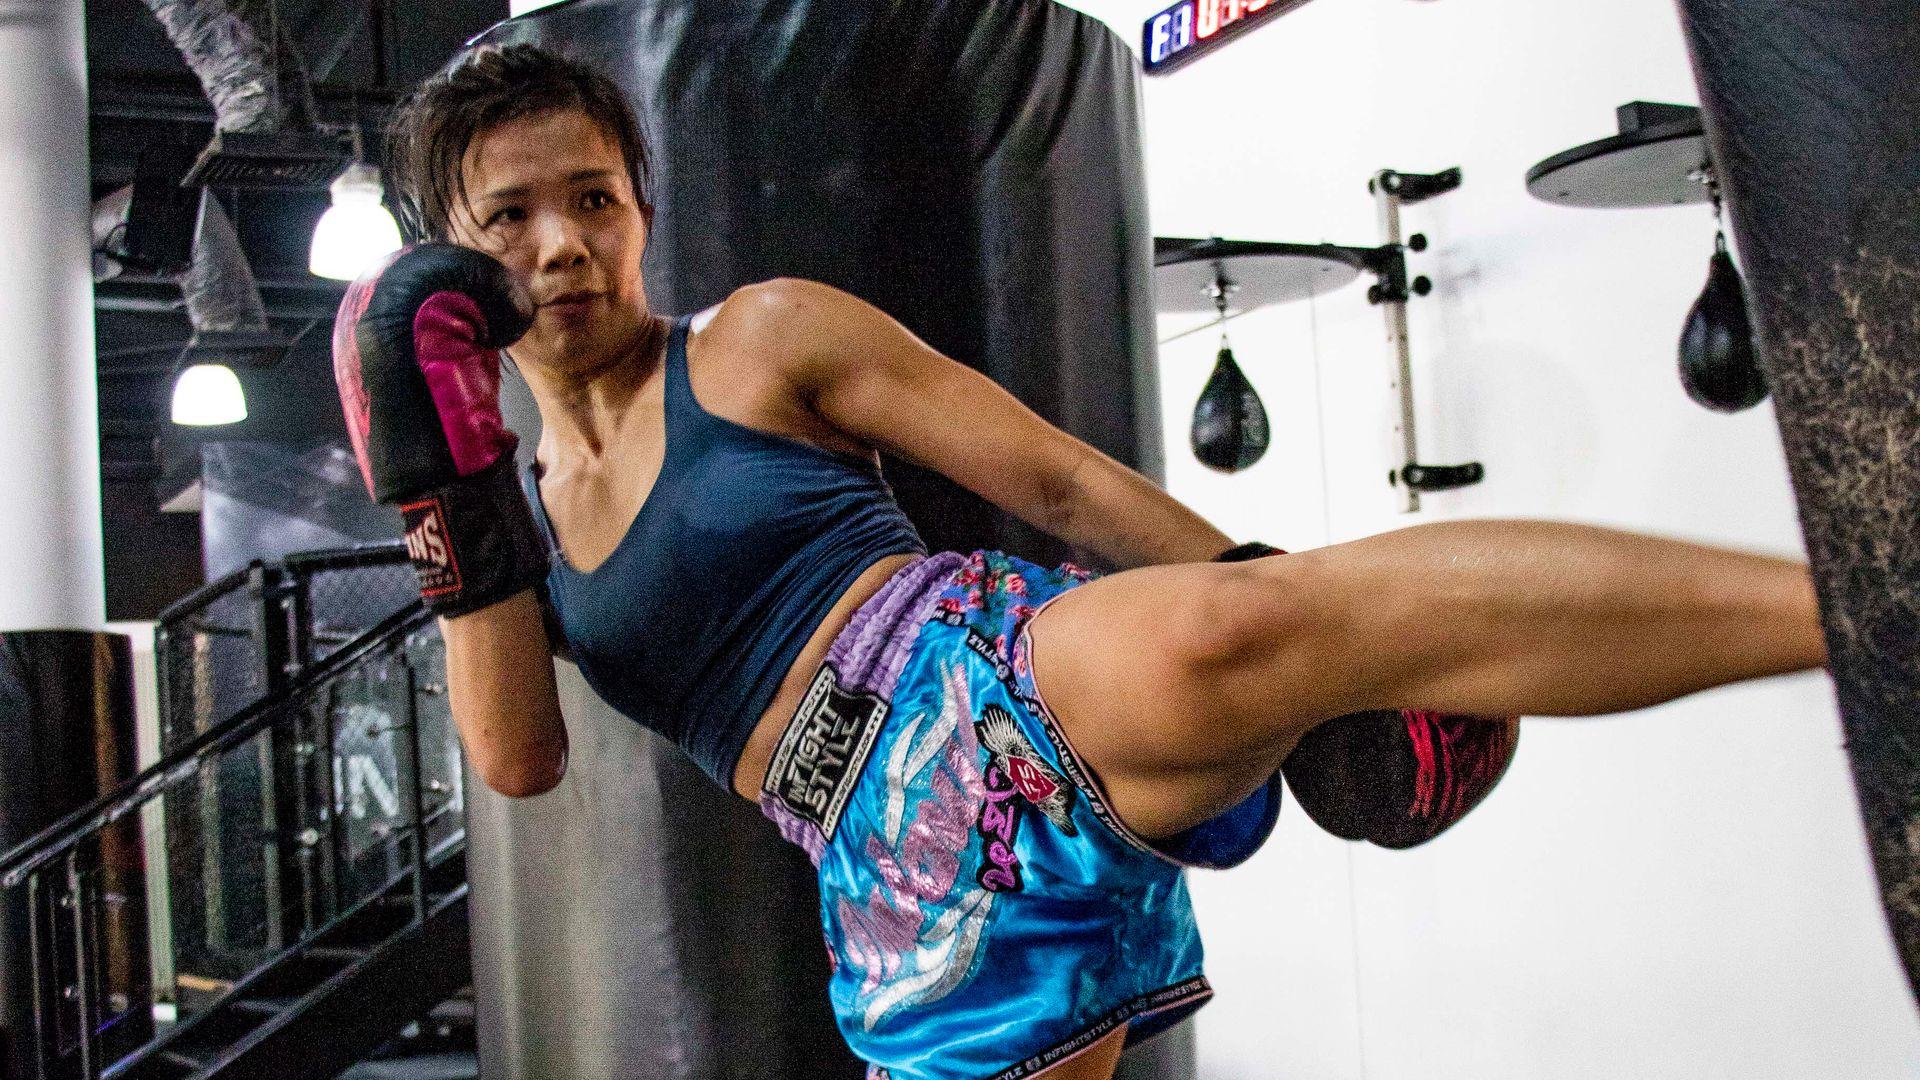 A female Muay Thai fighter kicks a bag at the gym.